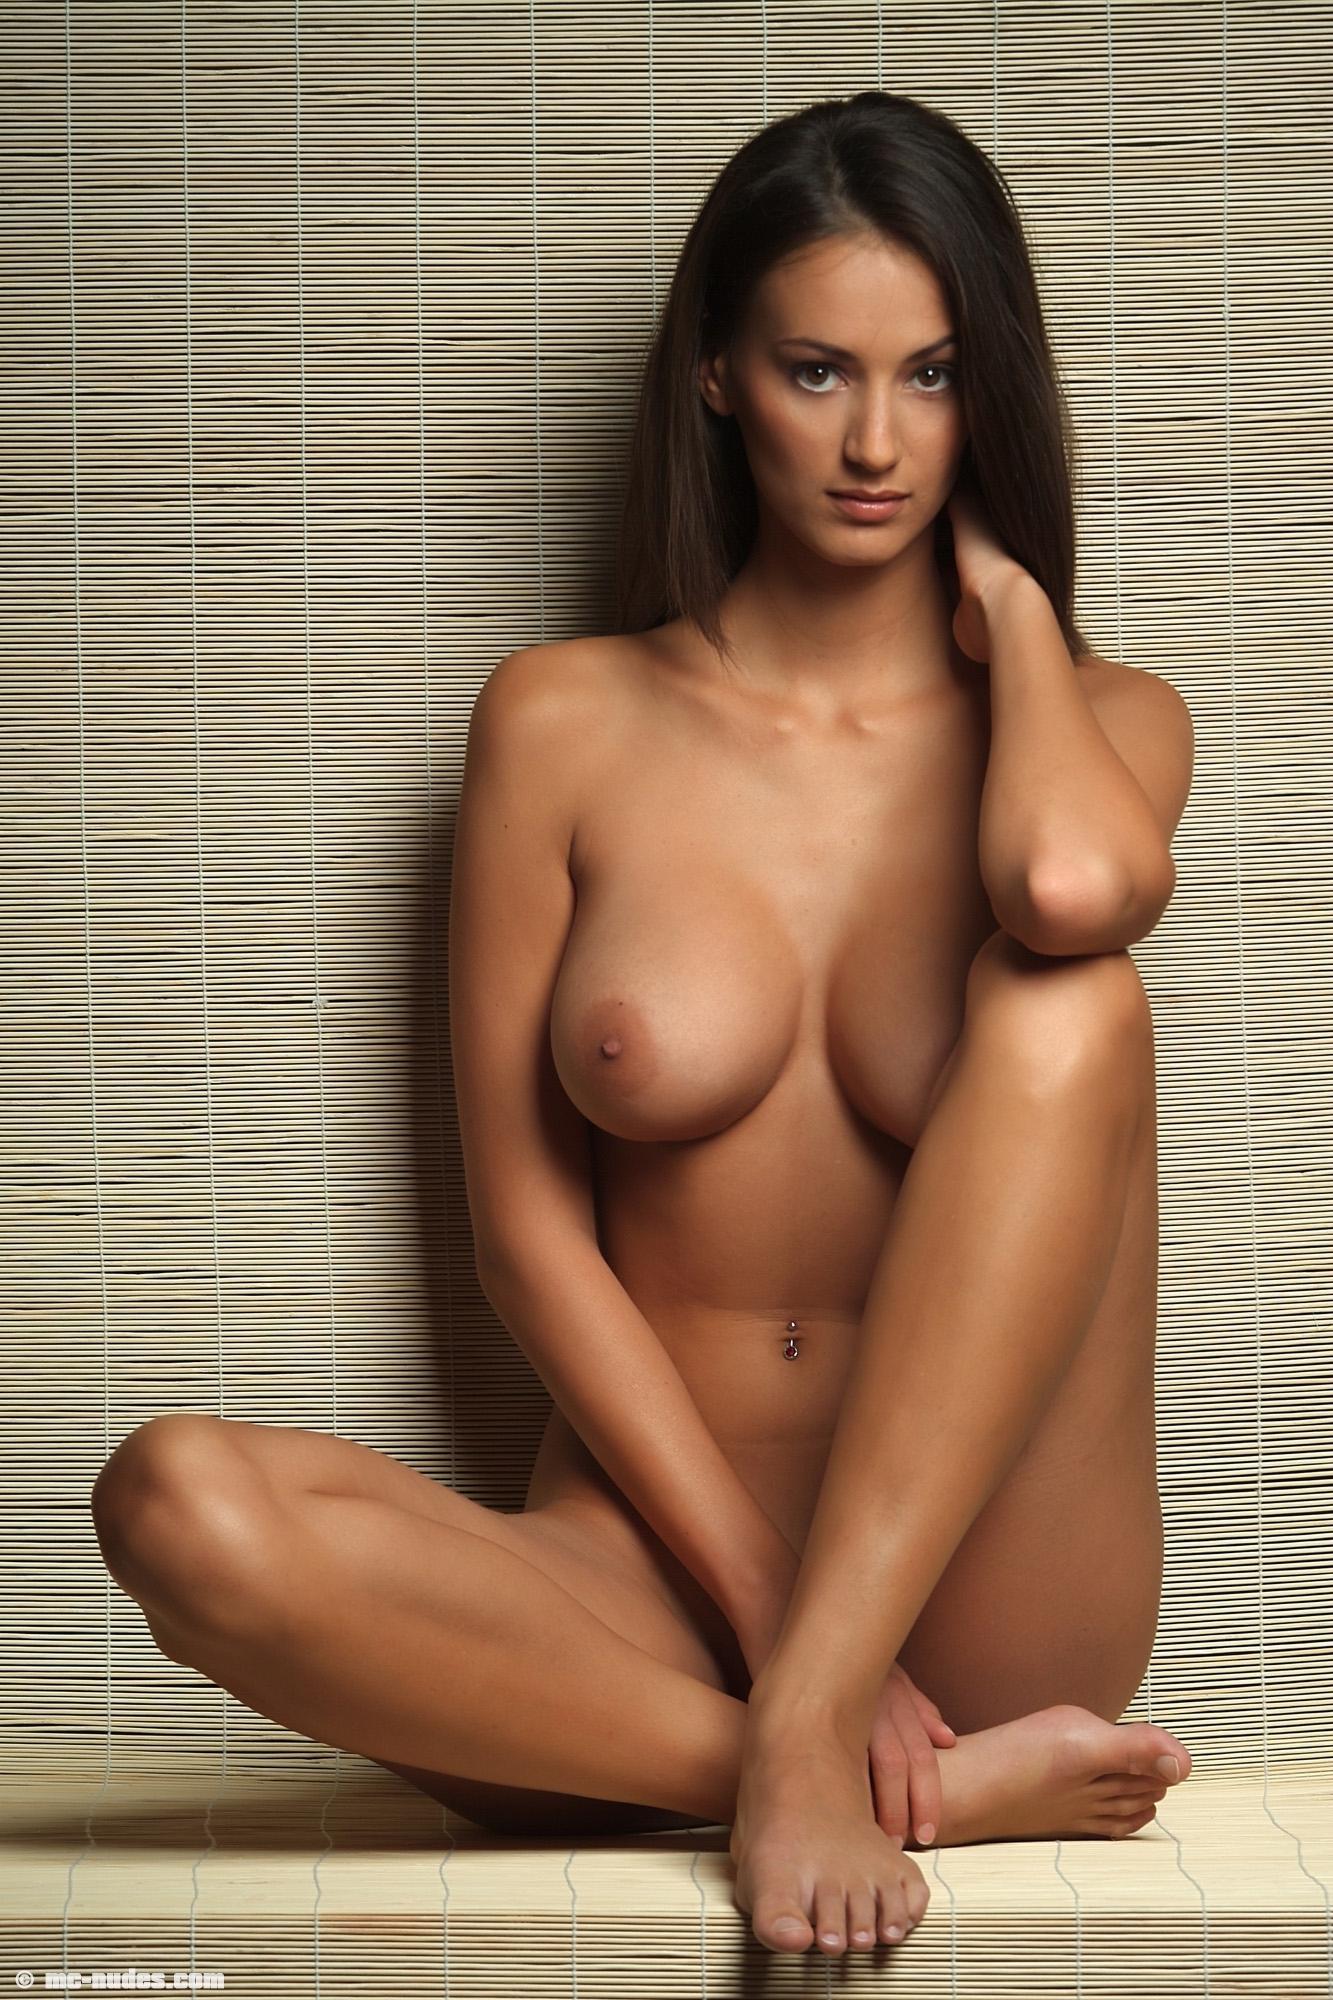 Jill valintine nude pics fucked vids